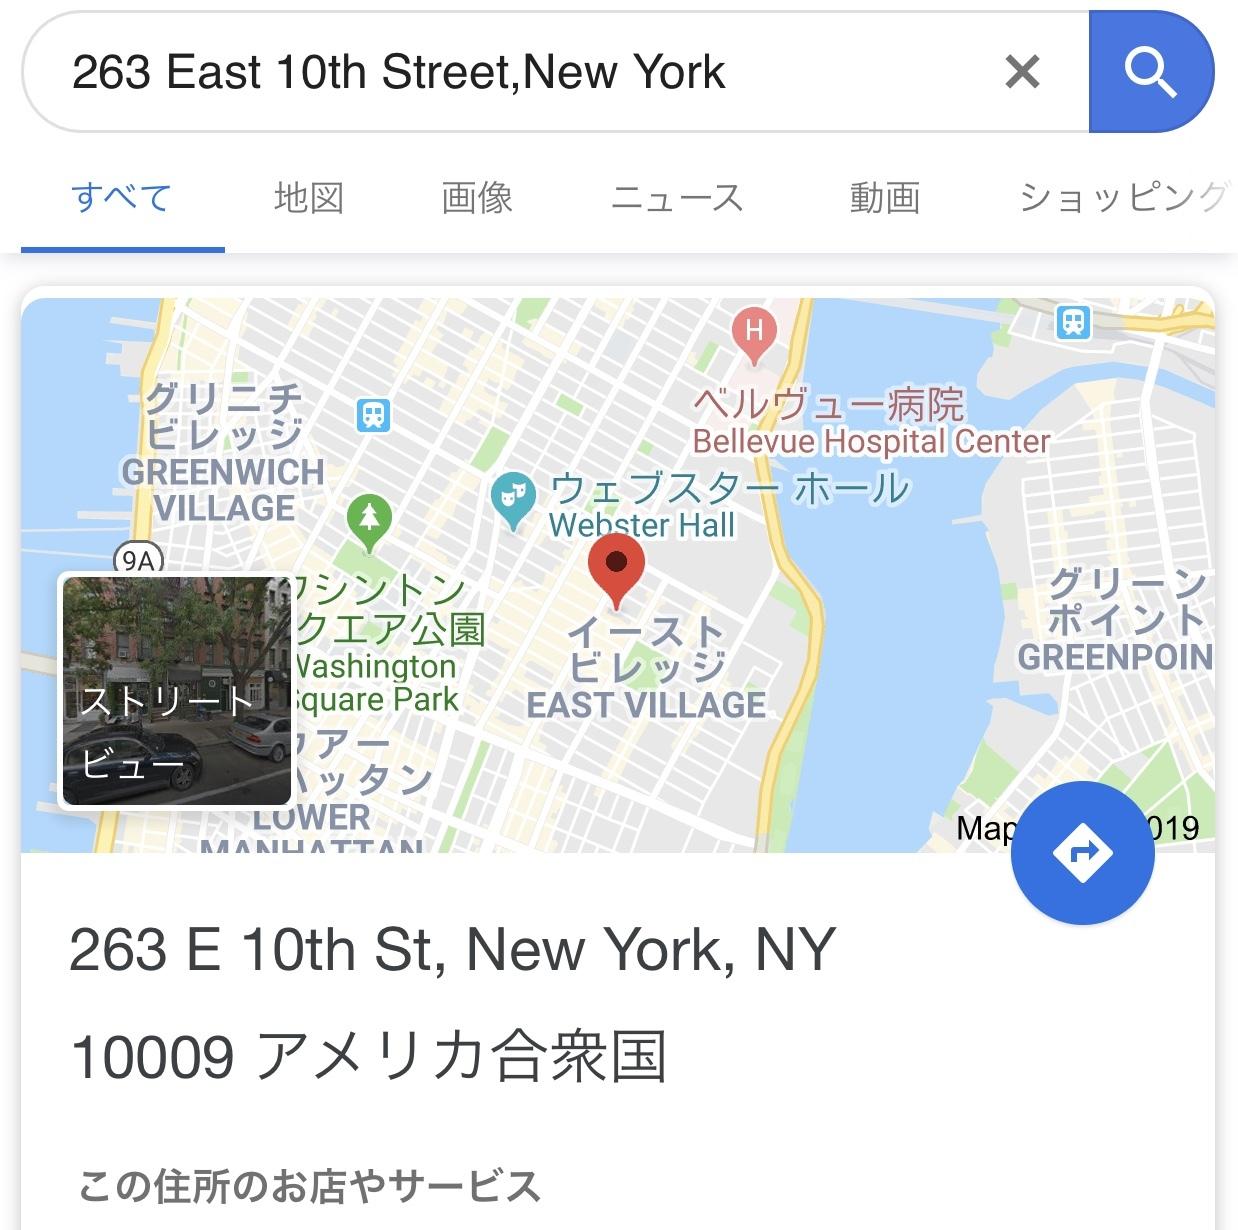 NYイーストビレッジのniconeco zakkaya さんに納品しています_a0137727_22150551.jpeg